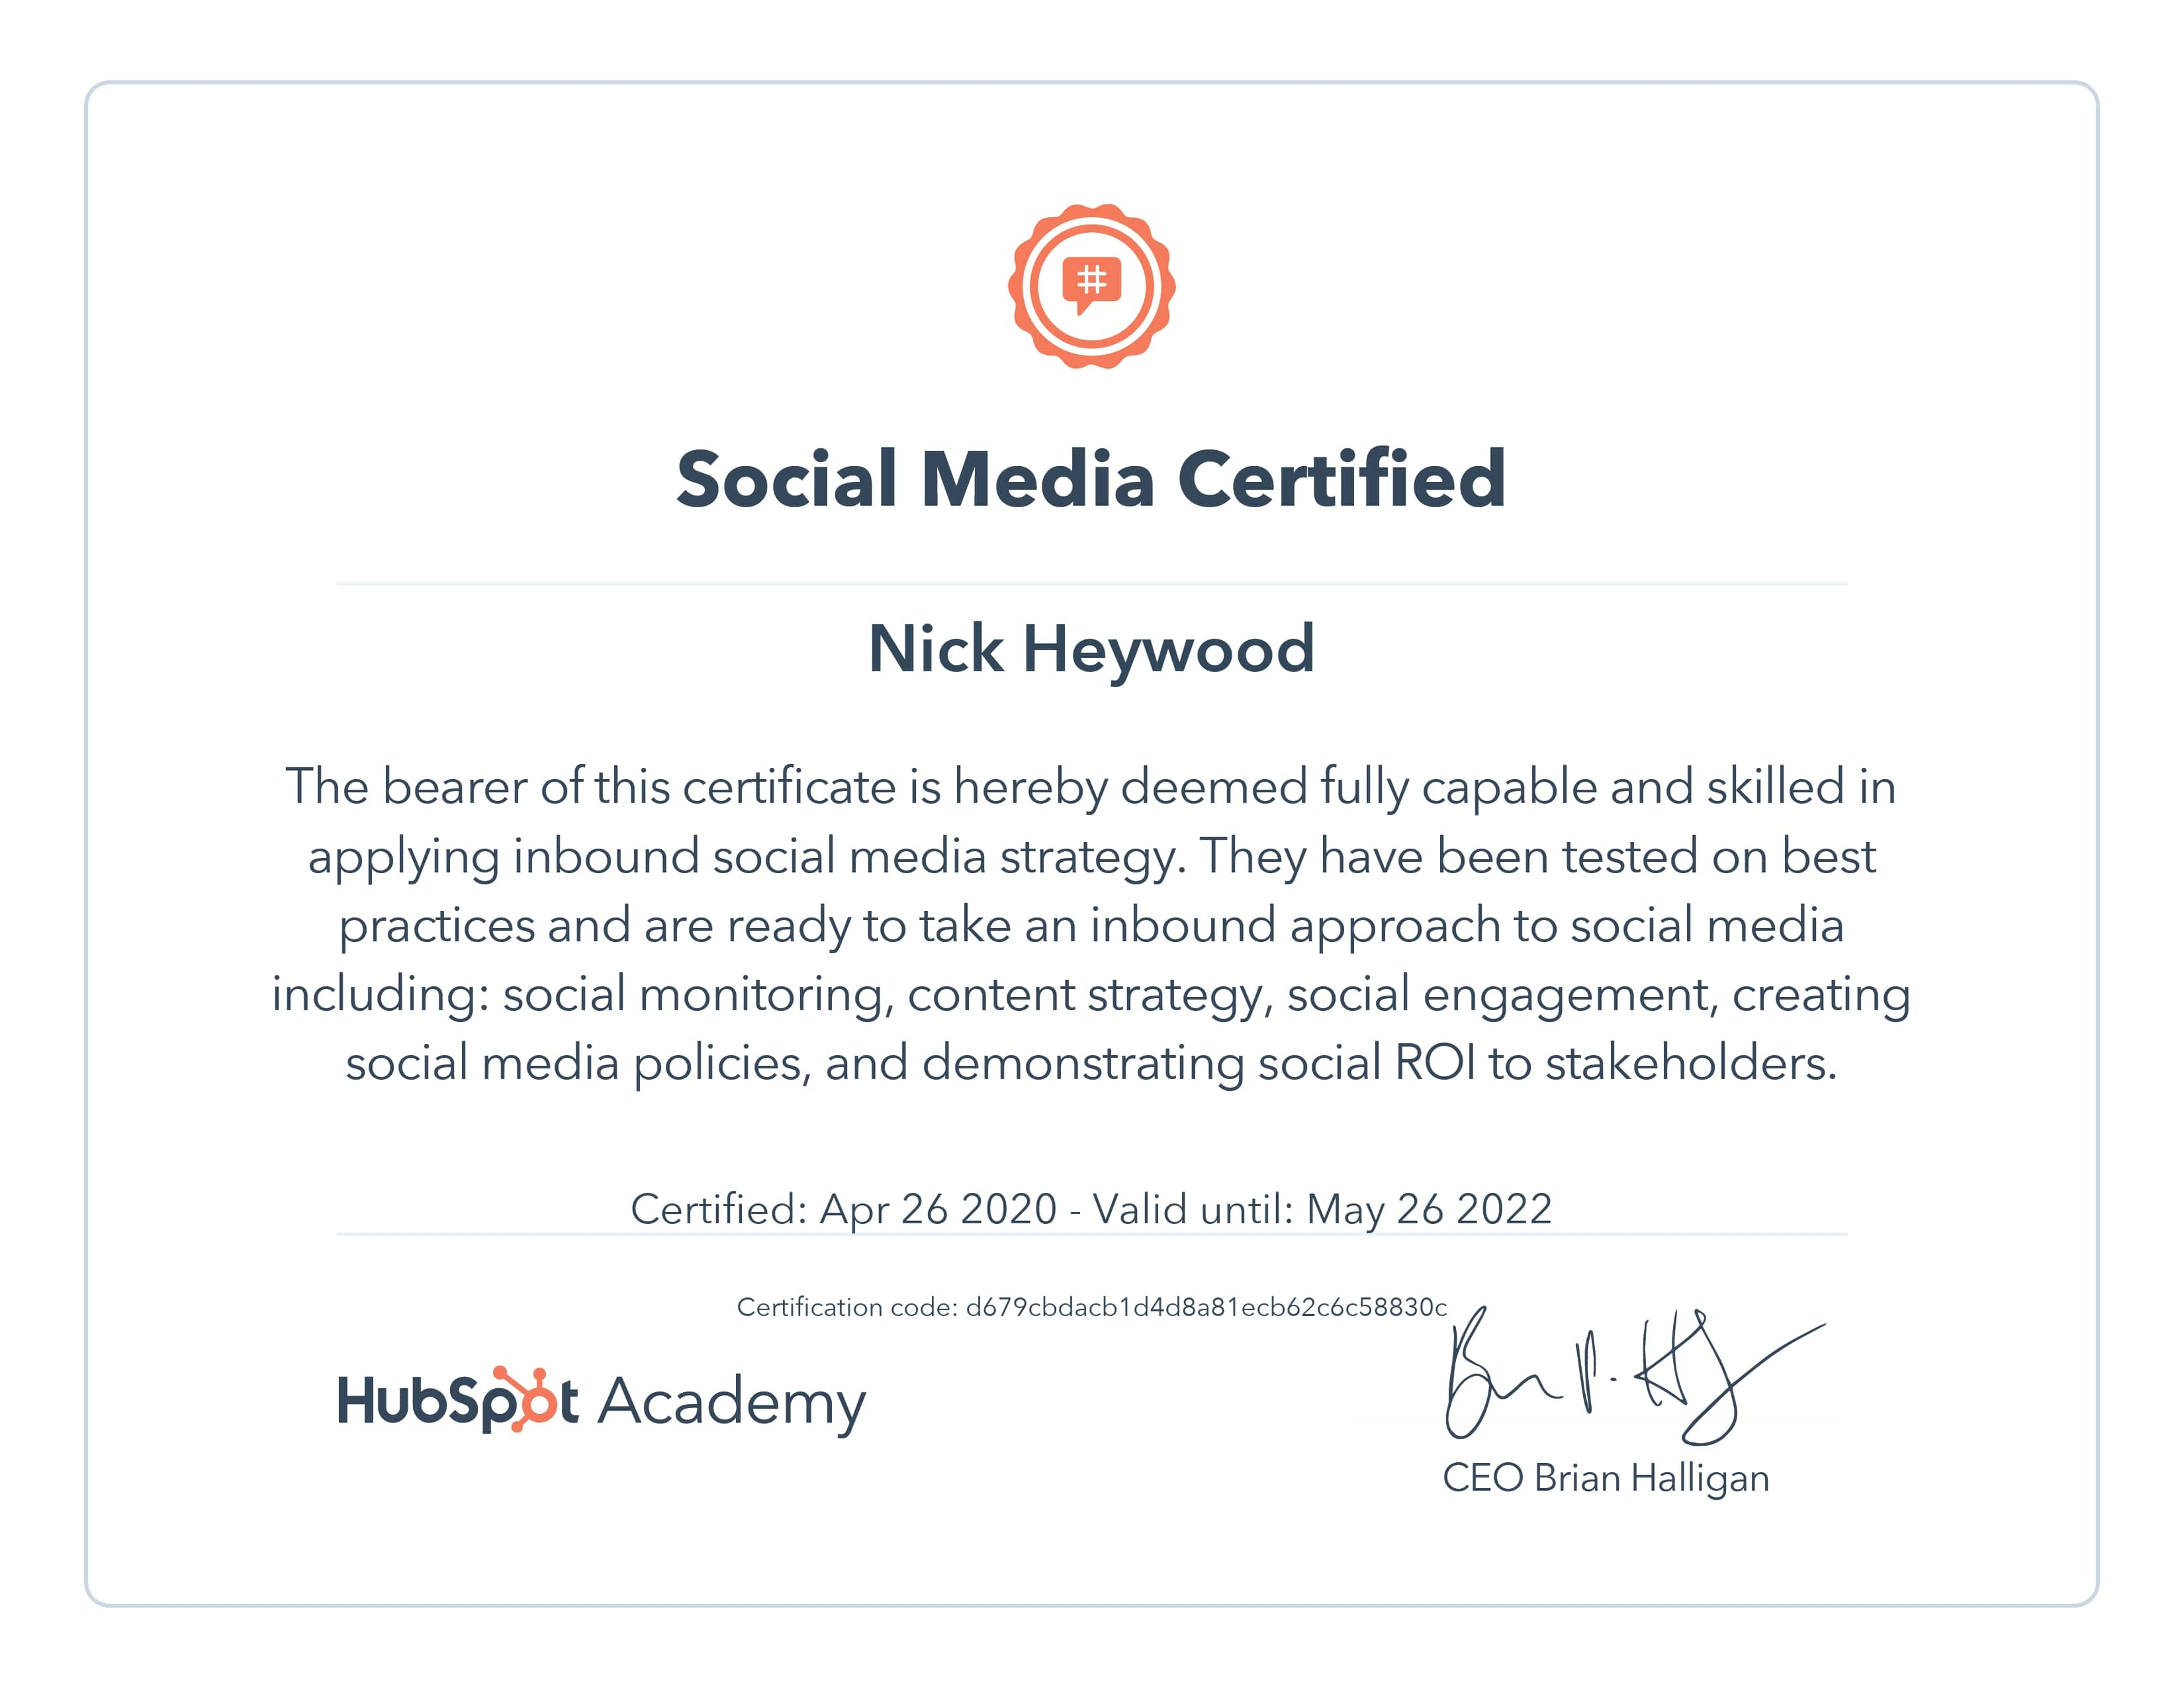 Hubspot Social Media Certificate - Nicholas Heywood